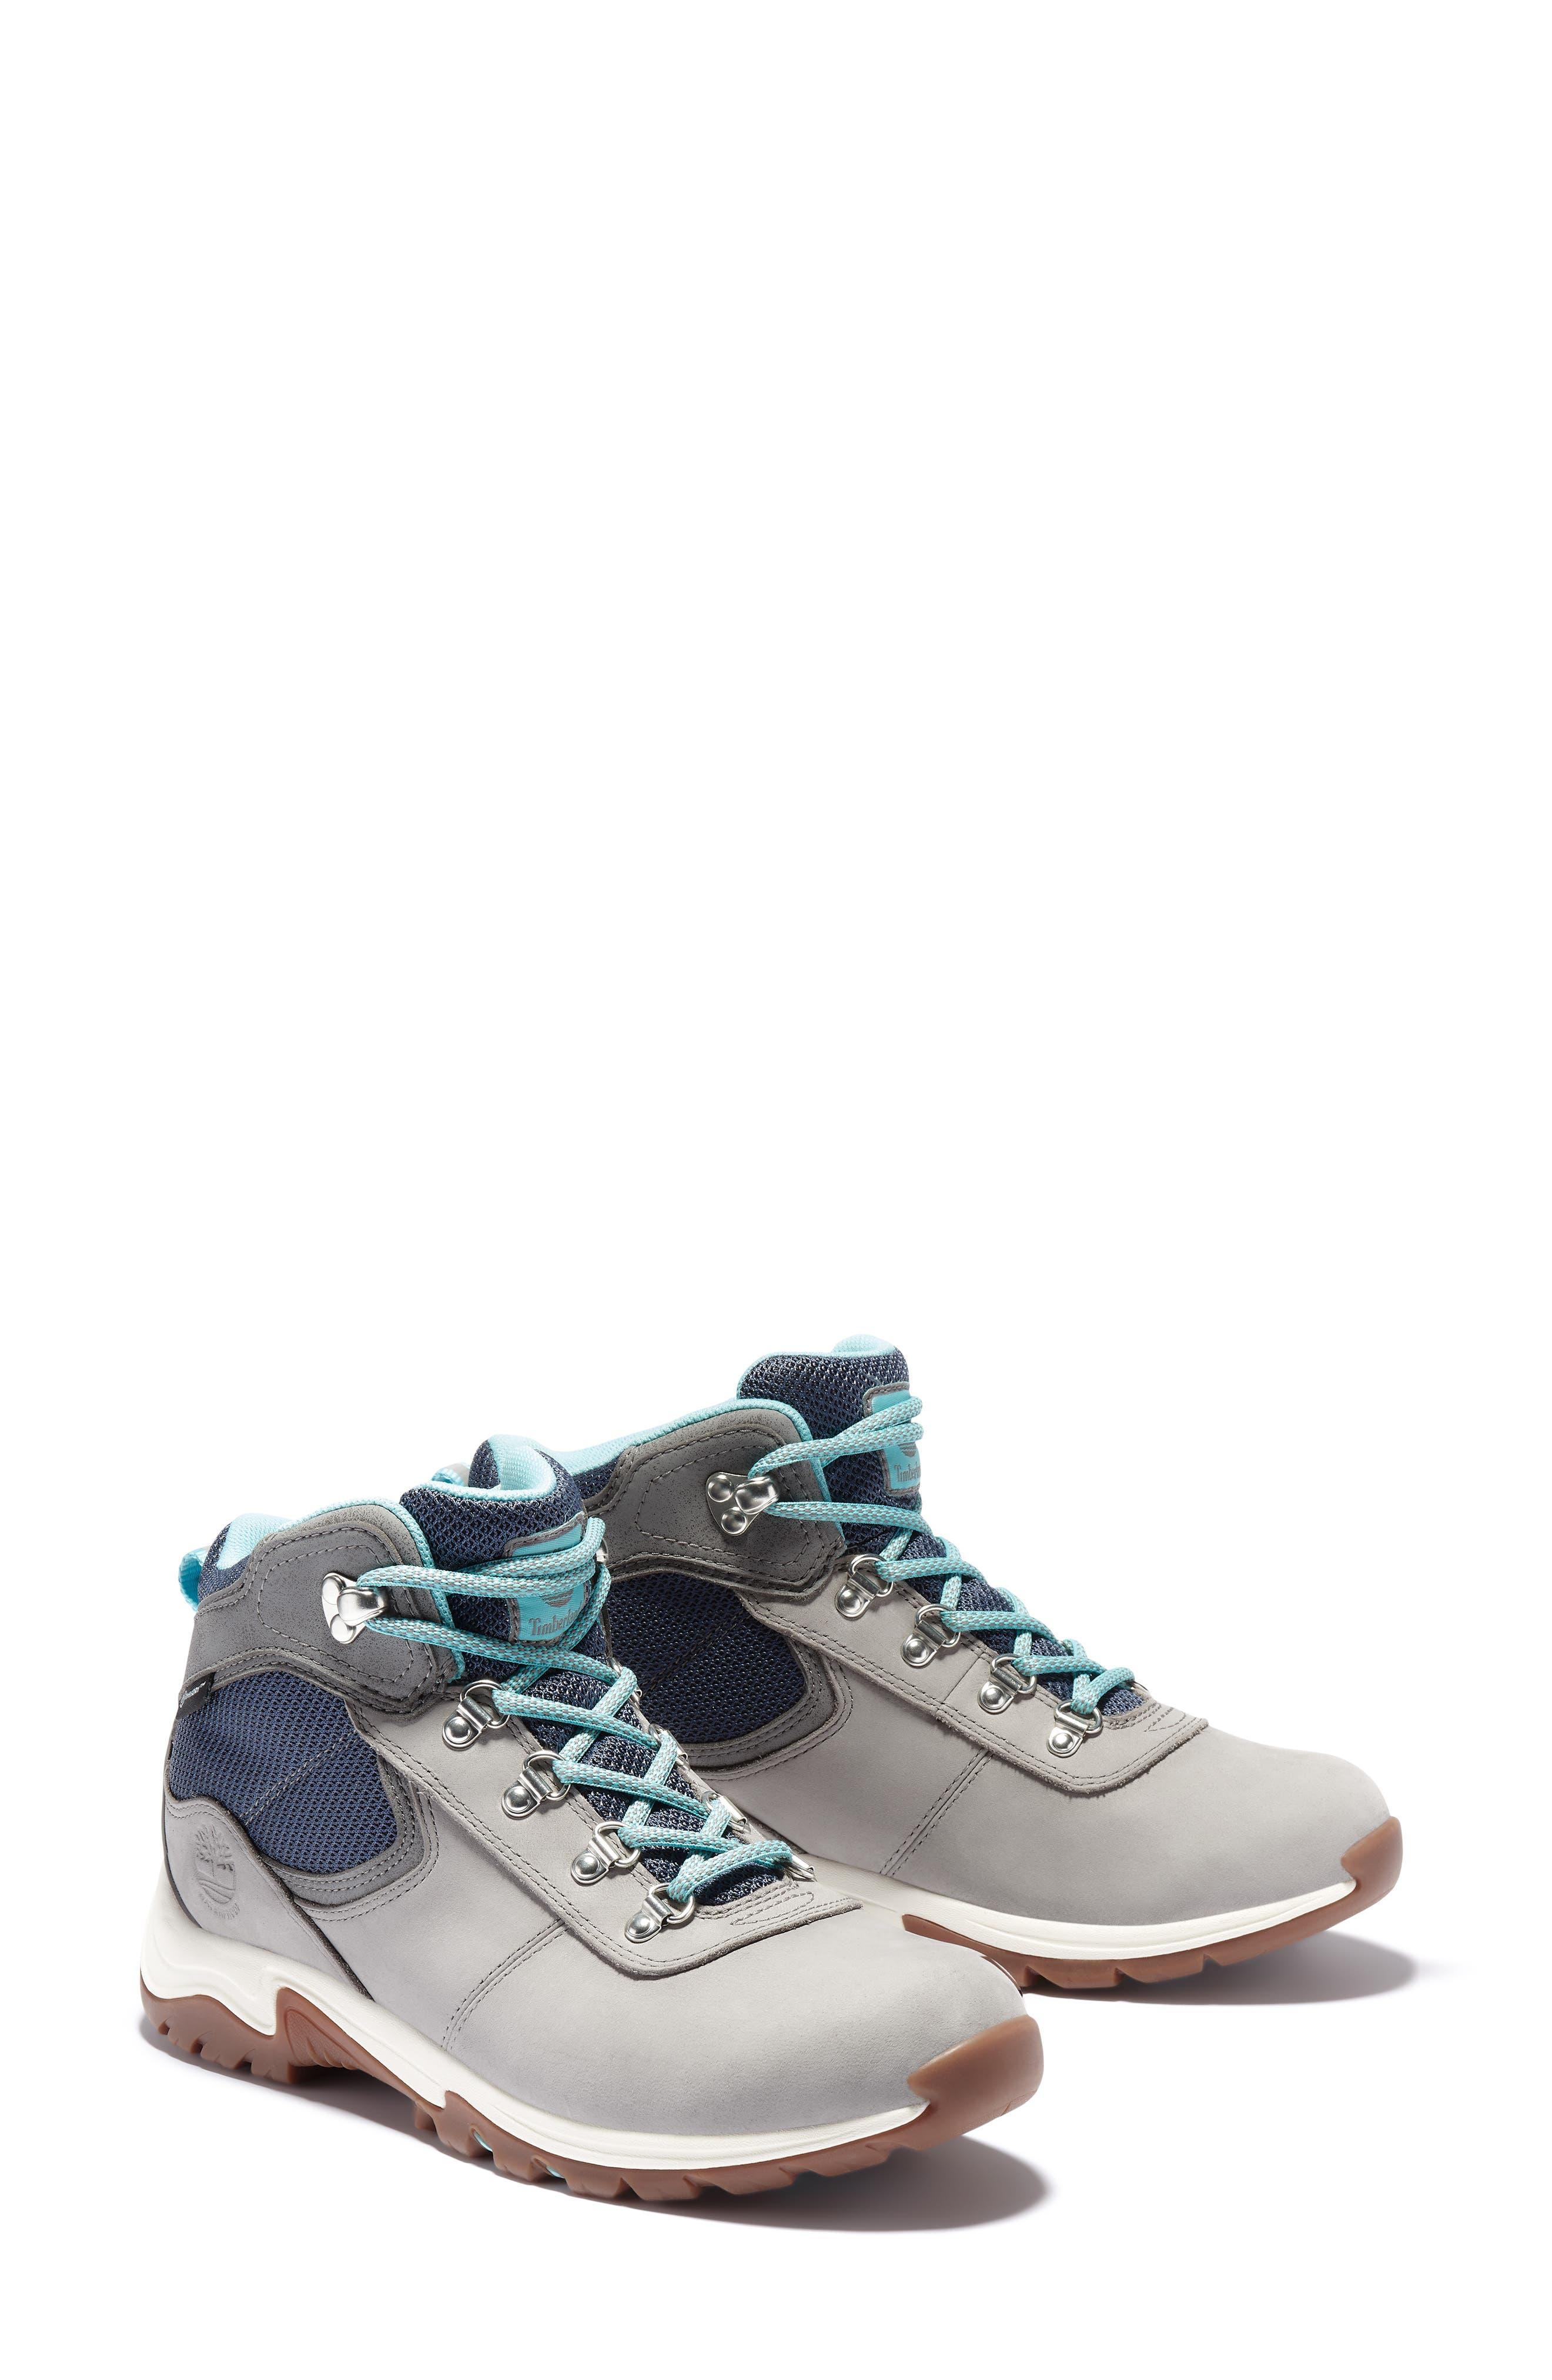 timberland maddsen boots